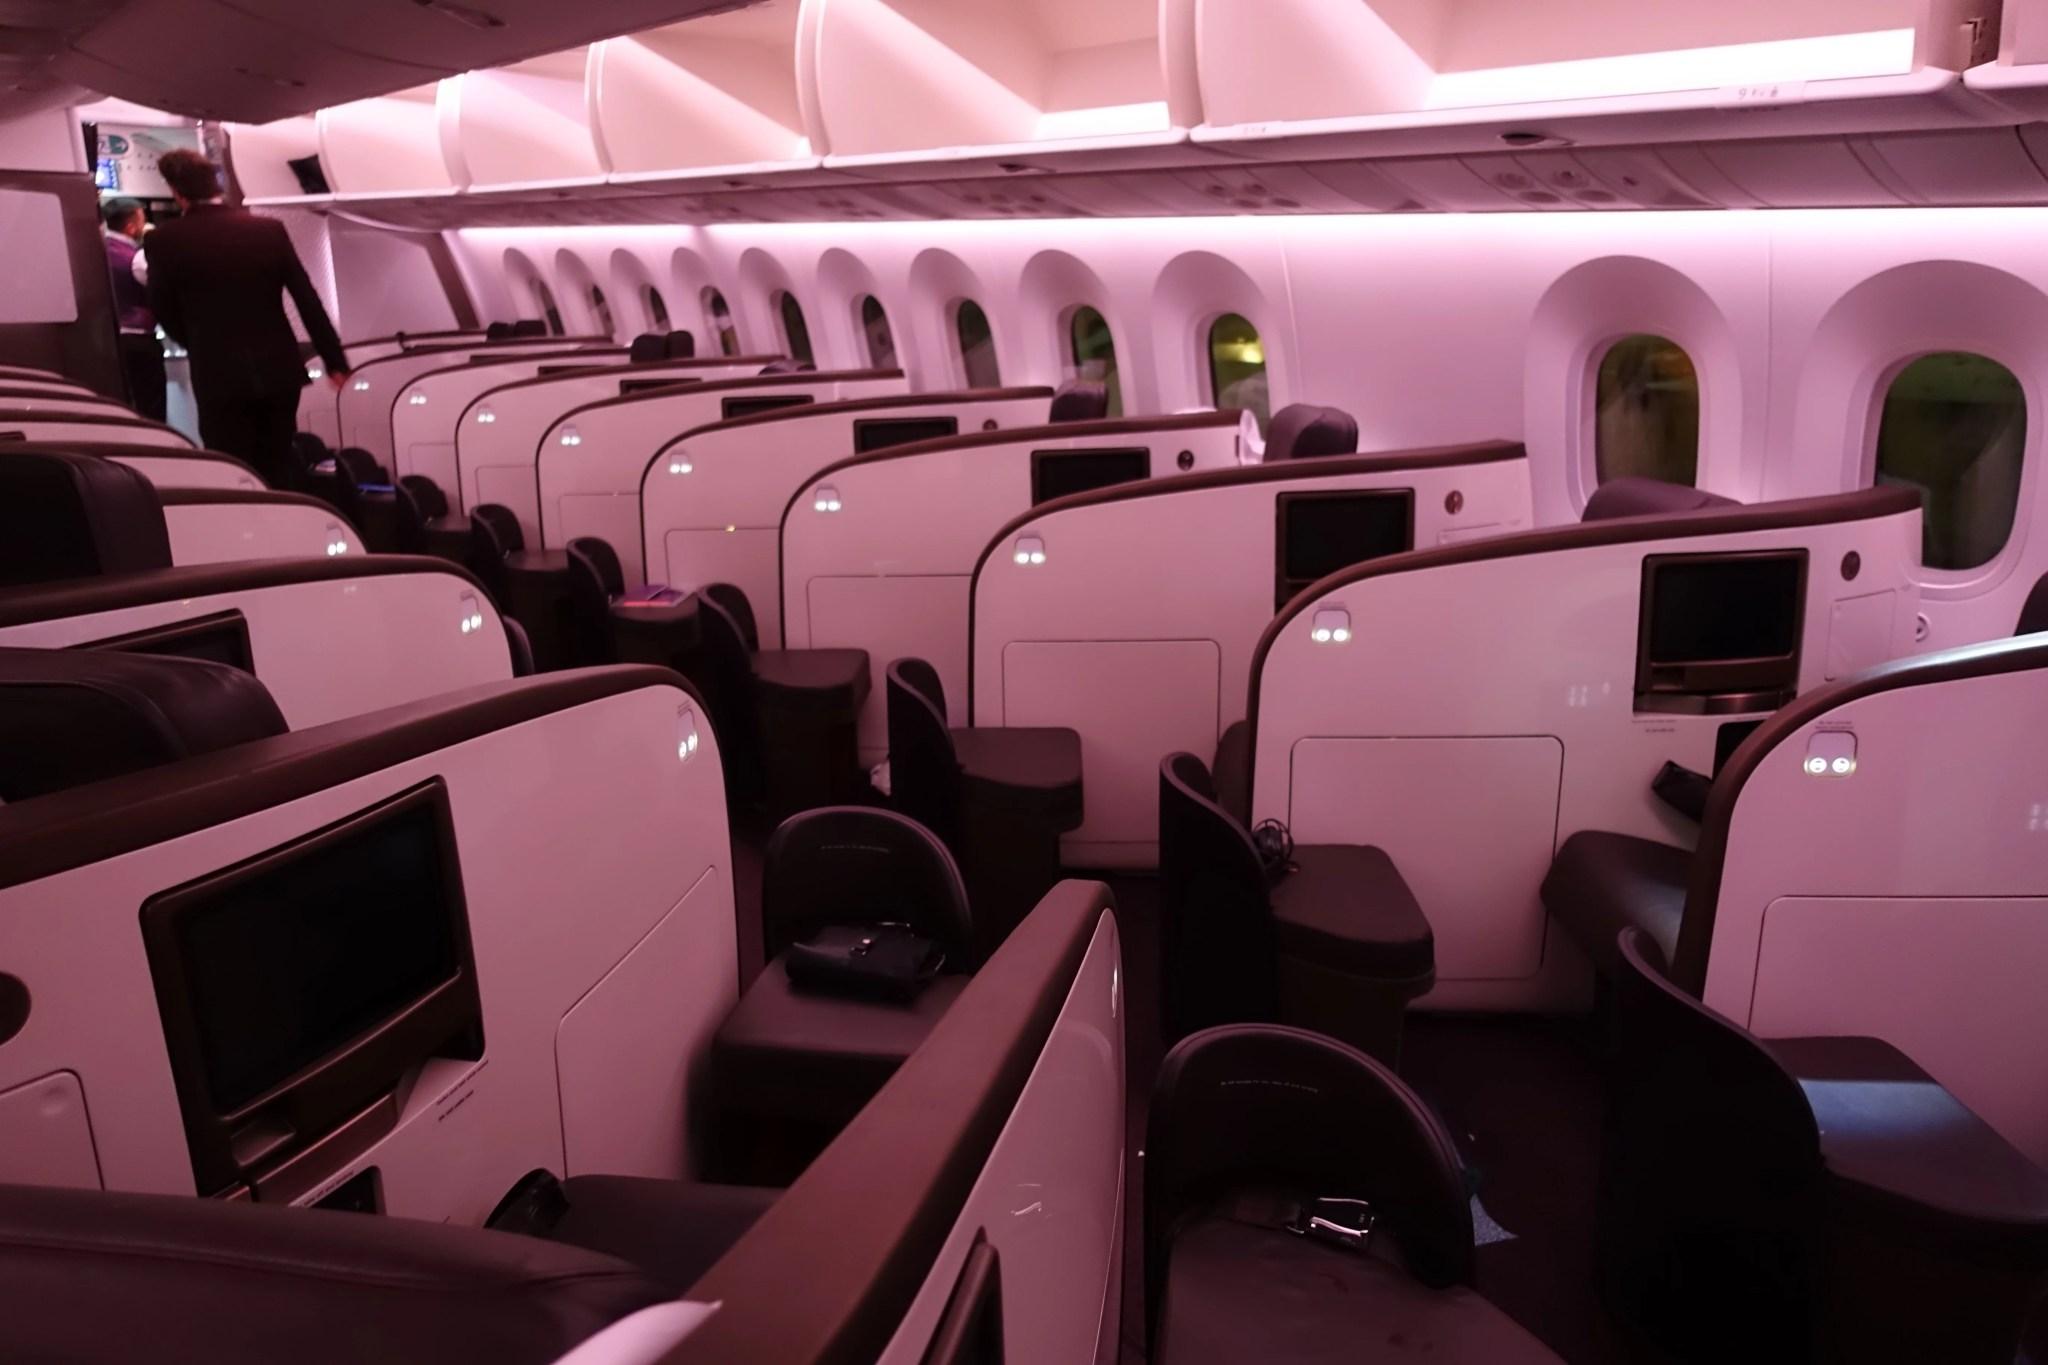 Review: Virgin Atlantic (787-9) Premium Economy, LHR to EWR